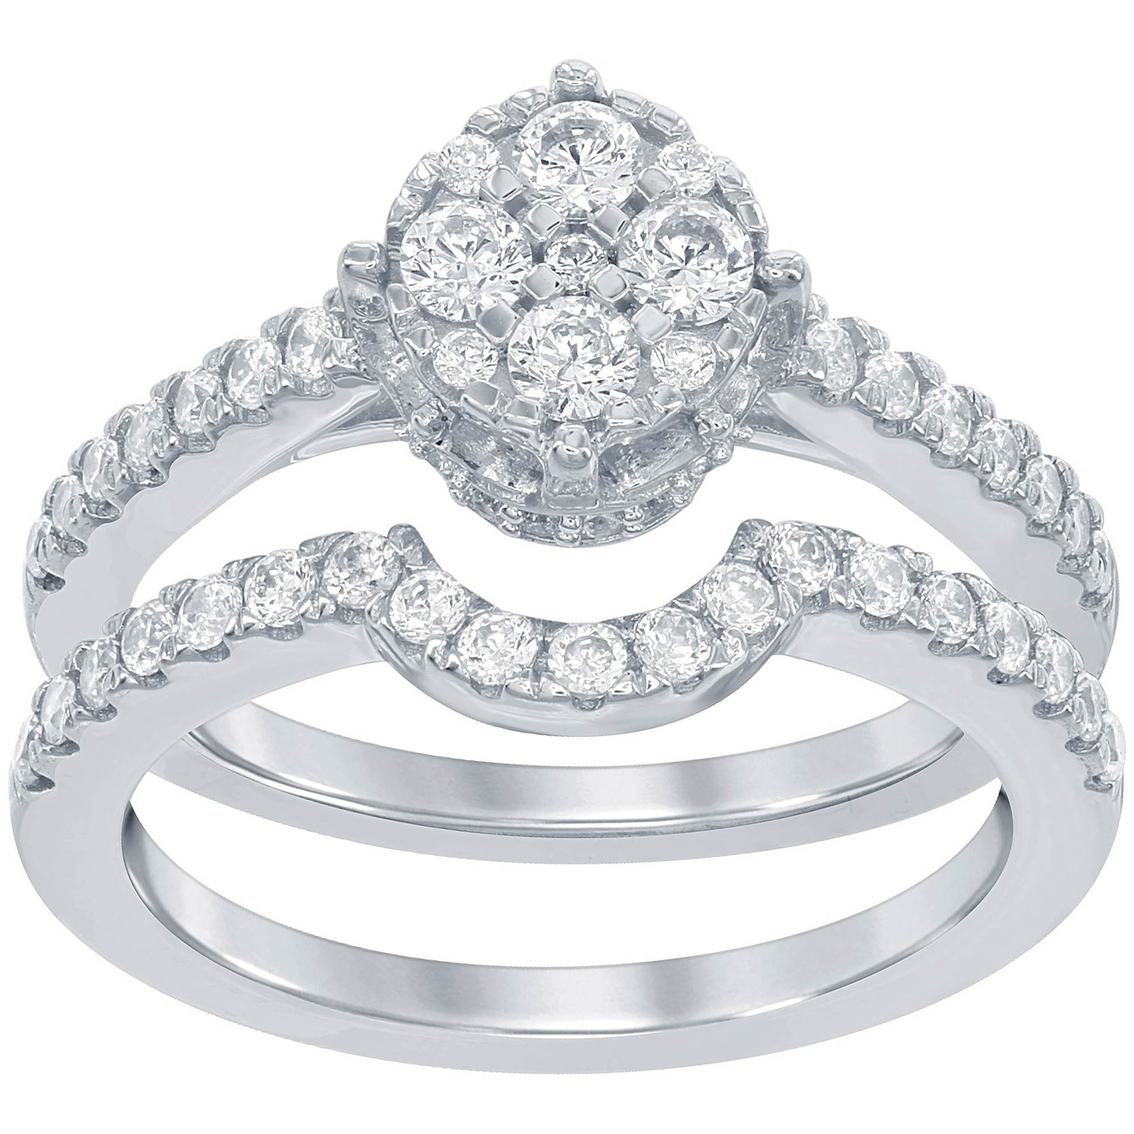 Disney Enchanted 14K White Gold 3 4 CTW Diamond Belle Bridal Set